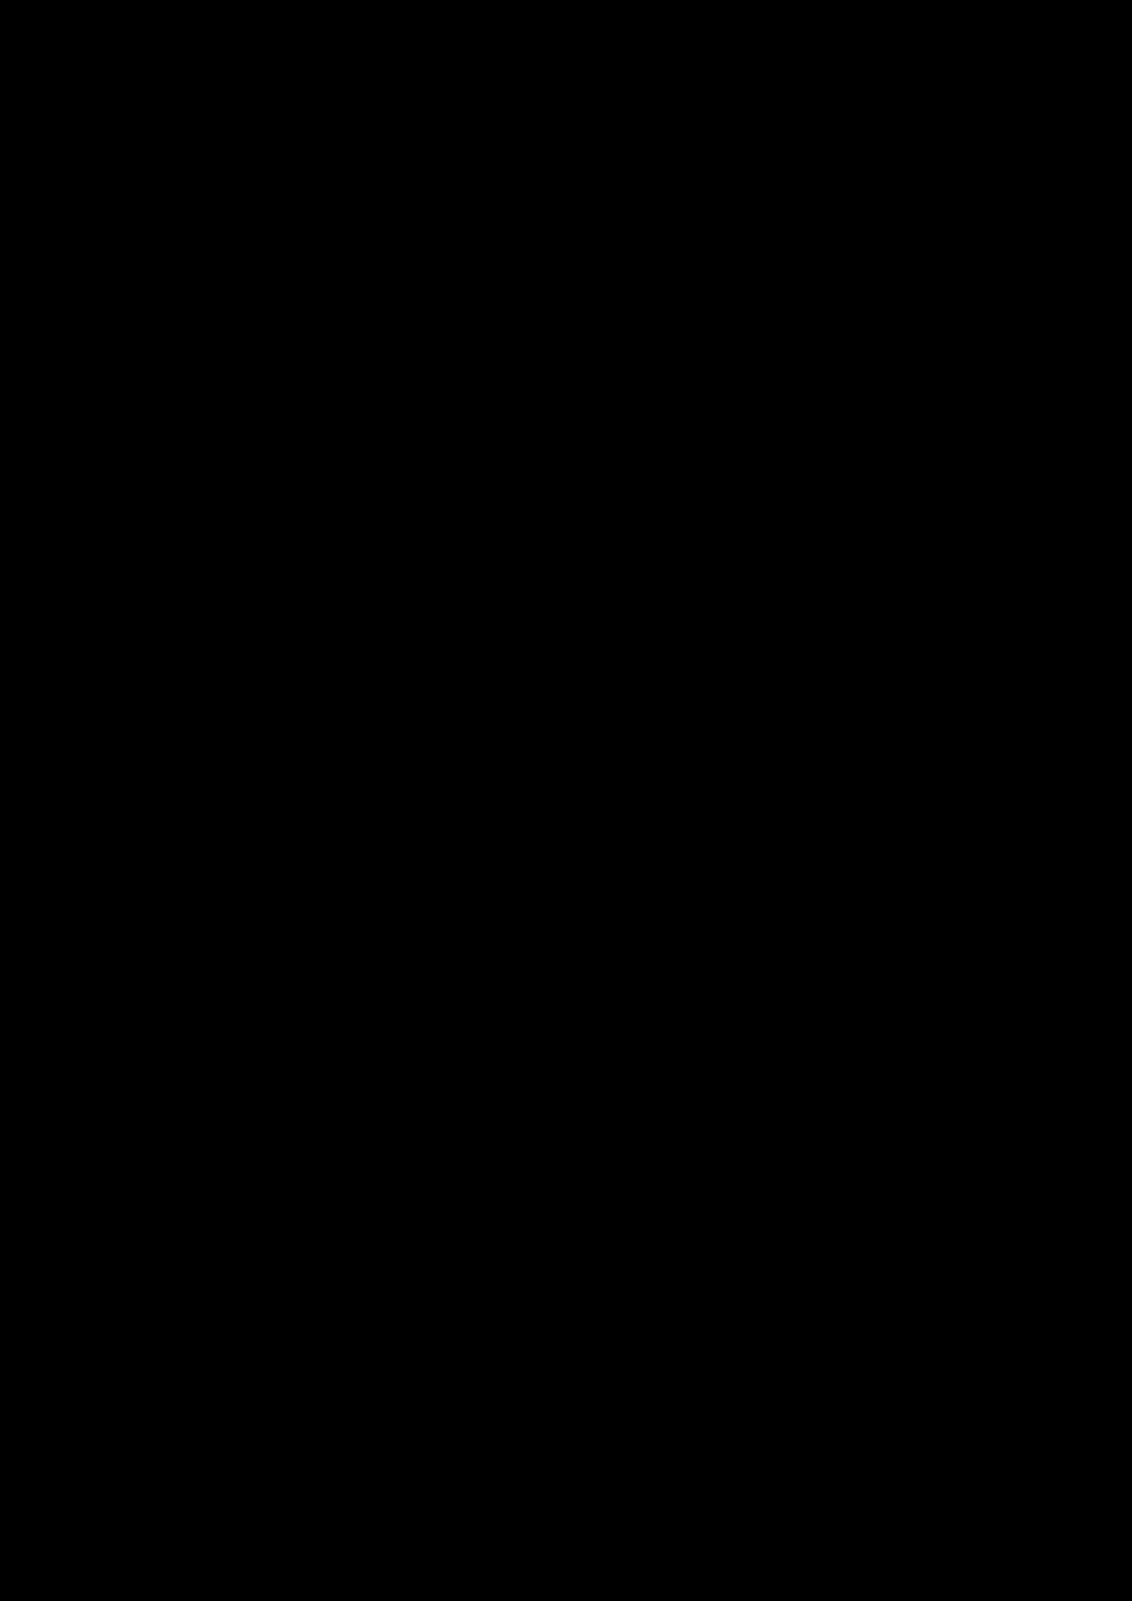 Okean Pustotyi slide, Image 10